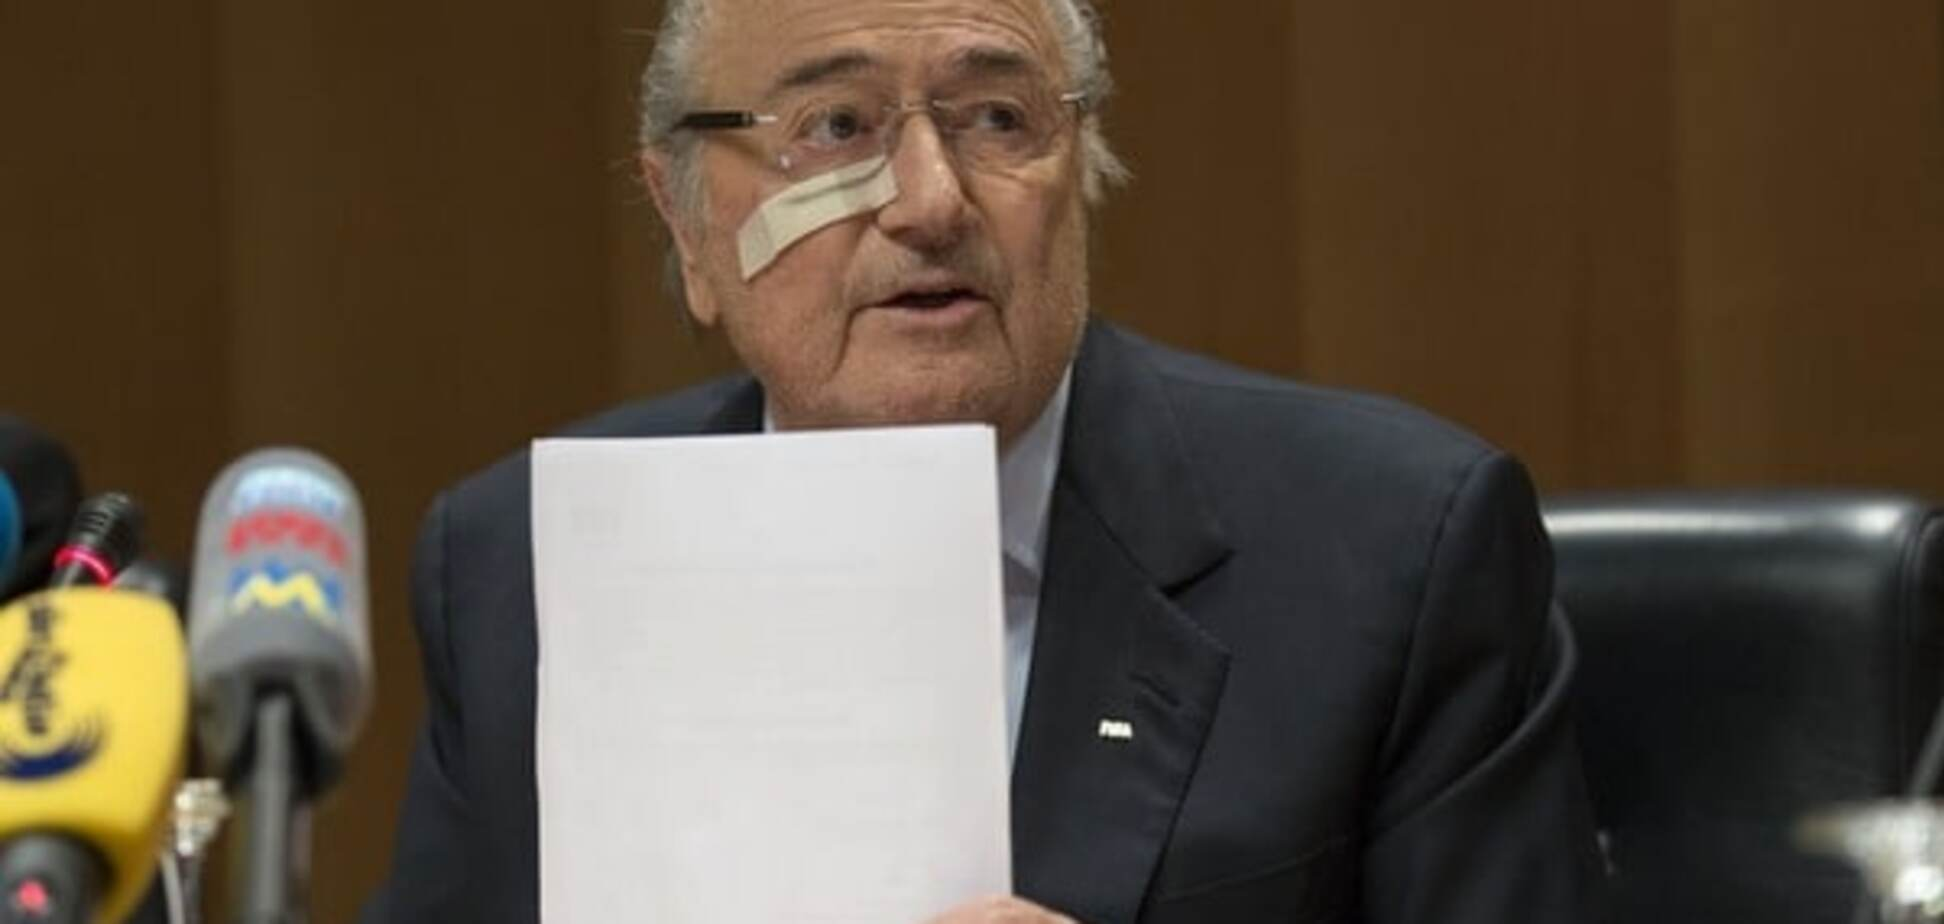 Официально: президент ФИФА Блаттер заявил об уходе из футбола